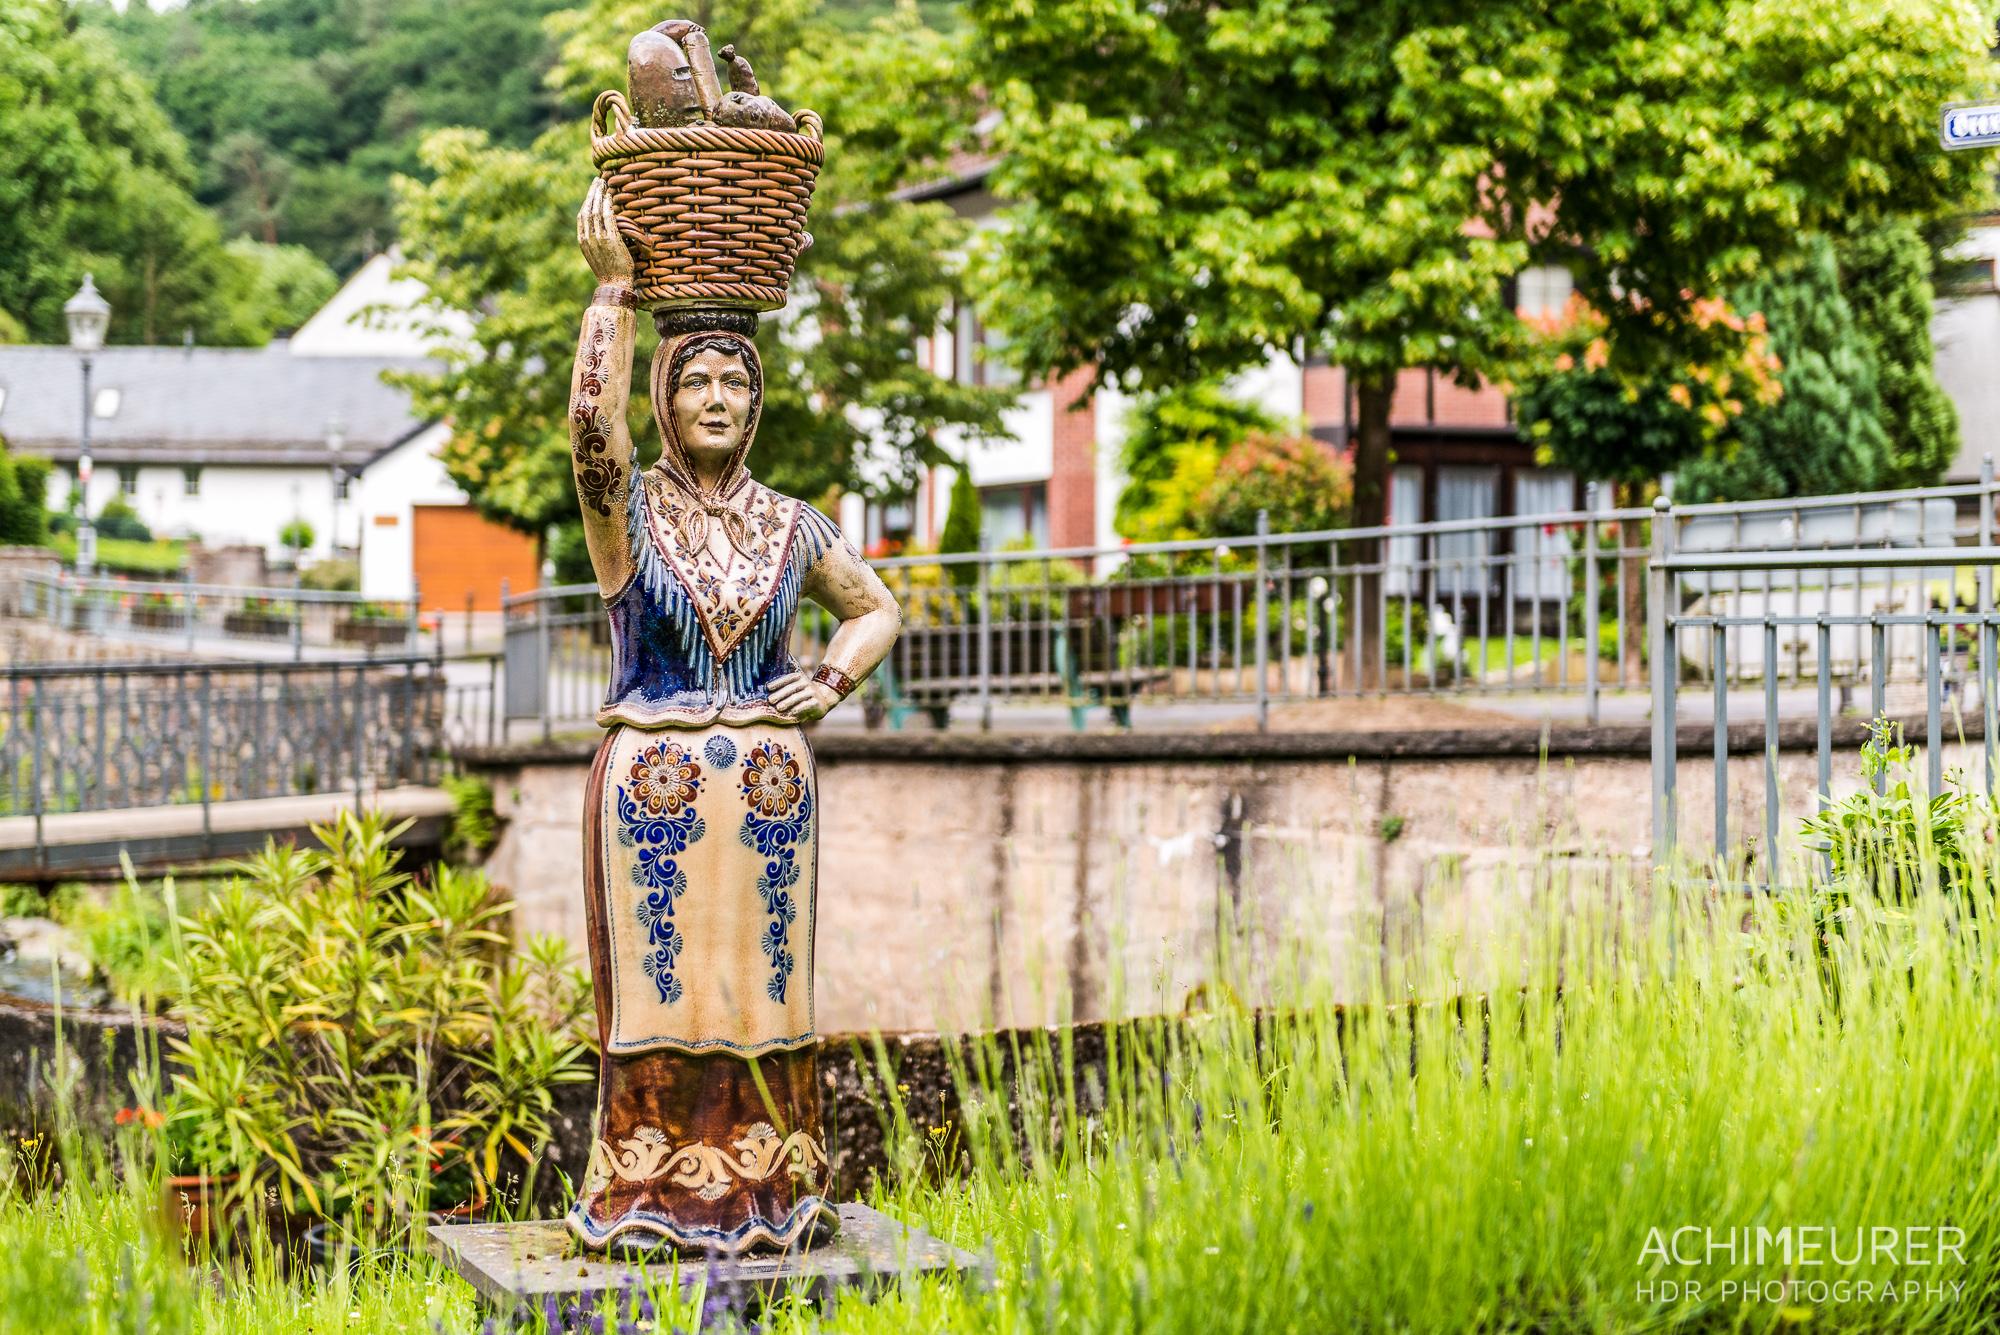 Kannenbaeckerland-keramik_4447-Bearbeitet